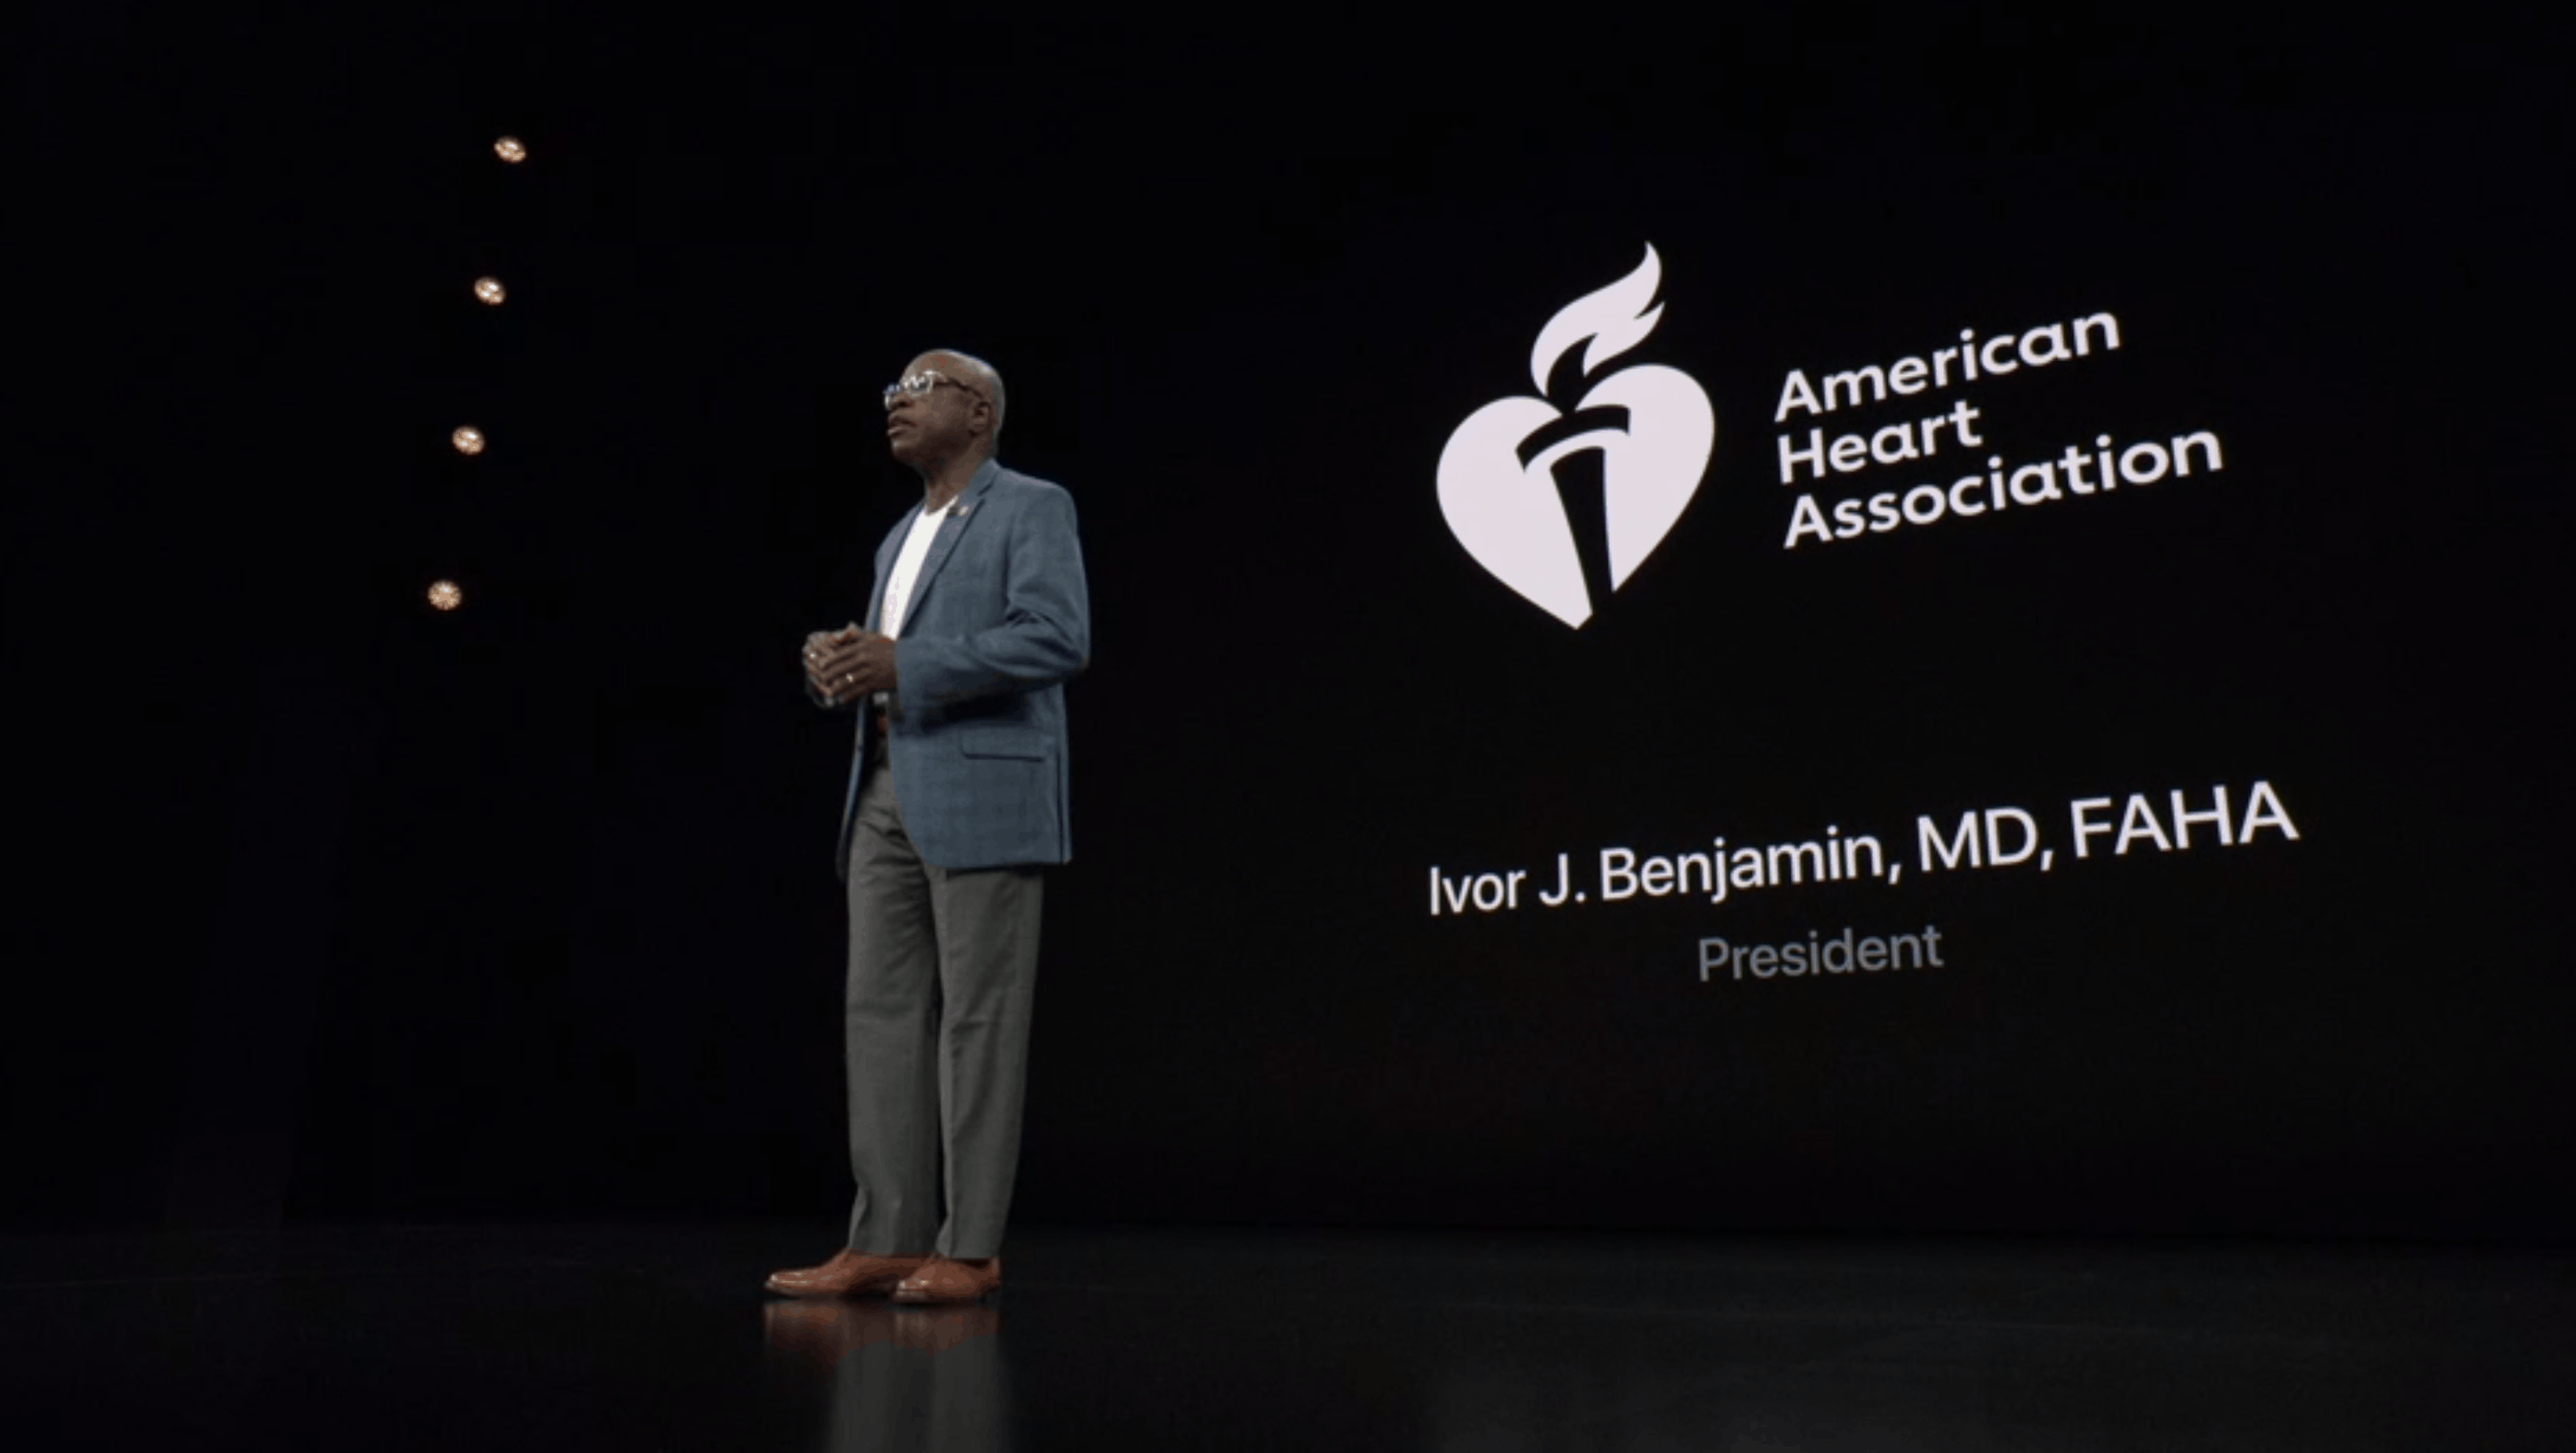 American Heart Association Apple Watch 4